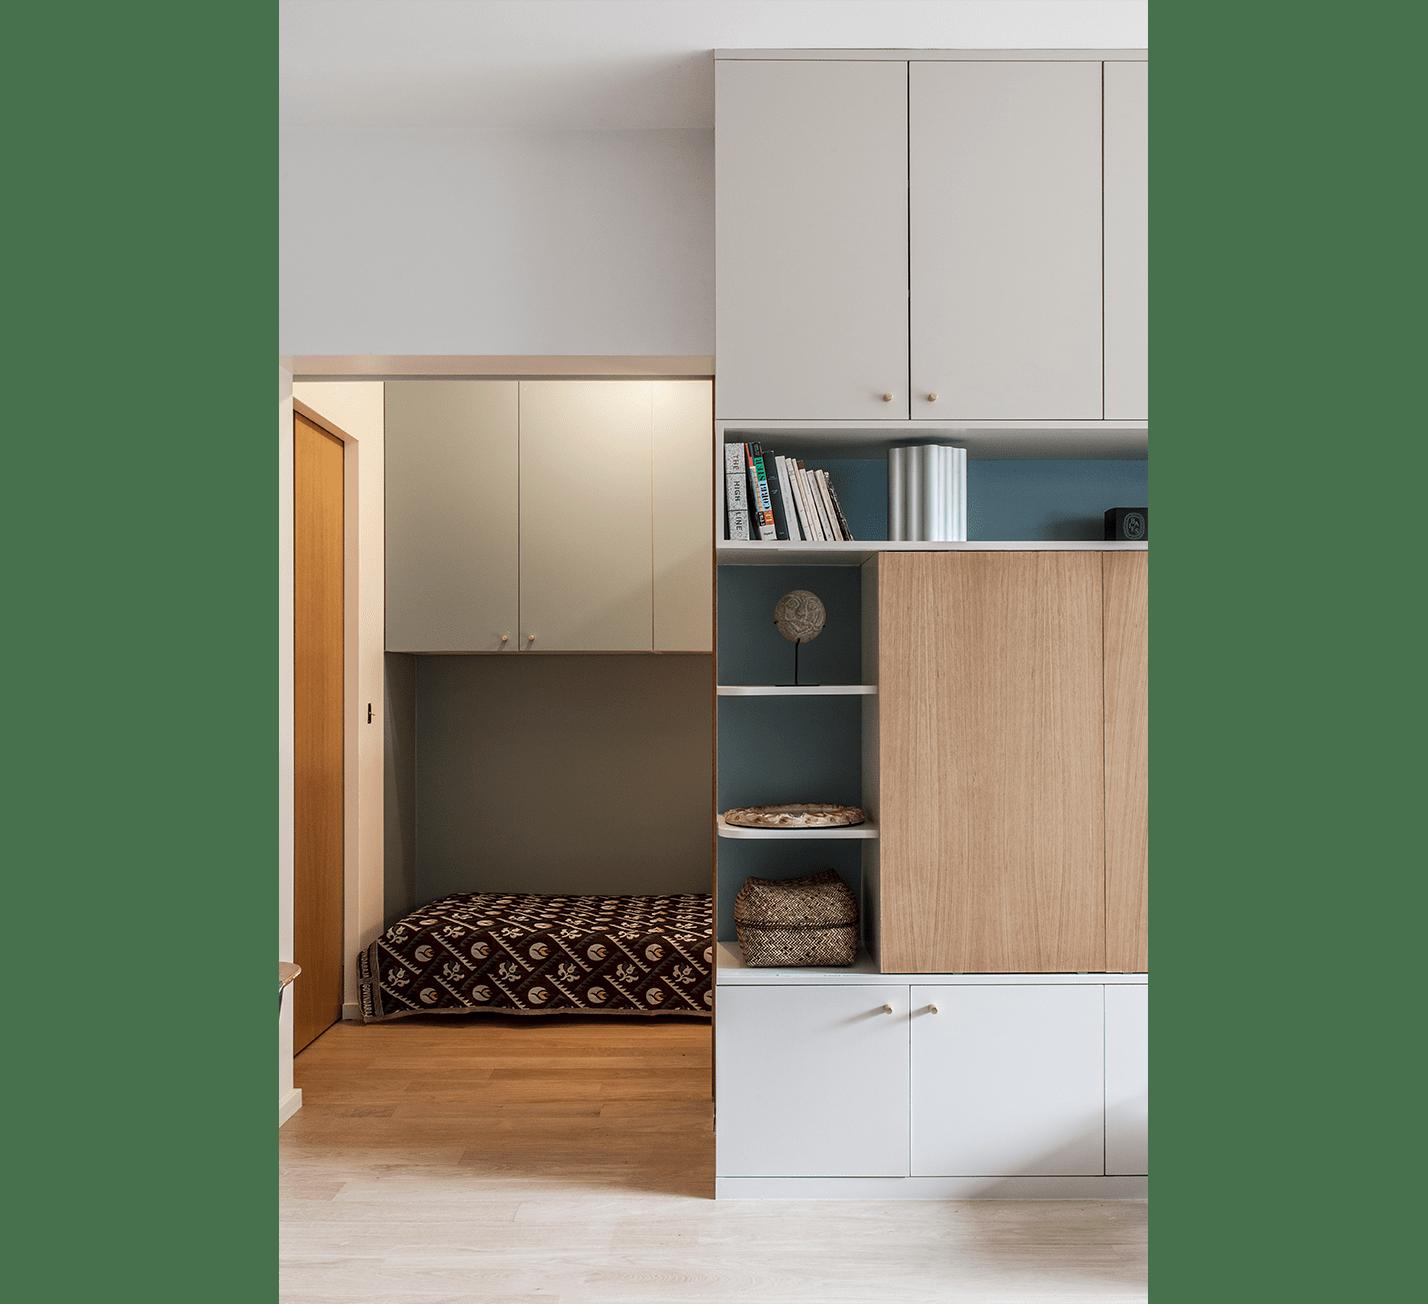 Projet-Albert-Atelier-Steve-Pauline-Borgia-Architecte-interieur-09-min-1